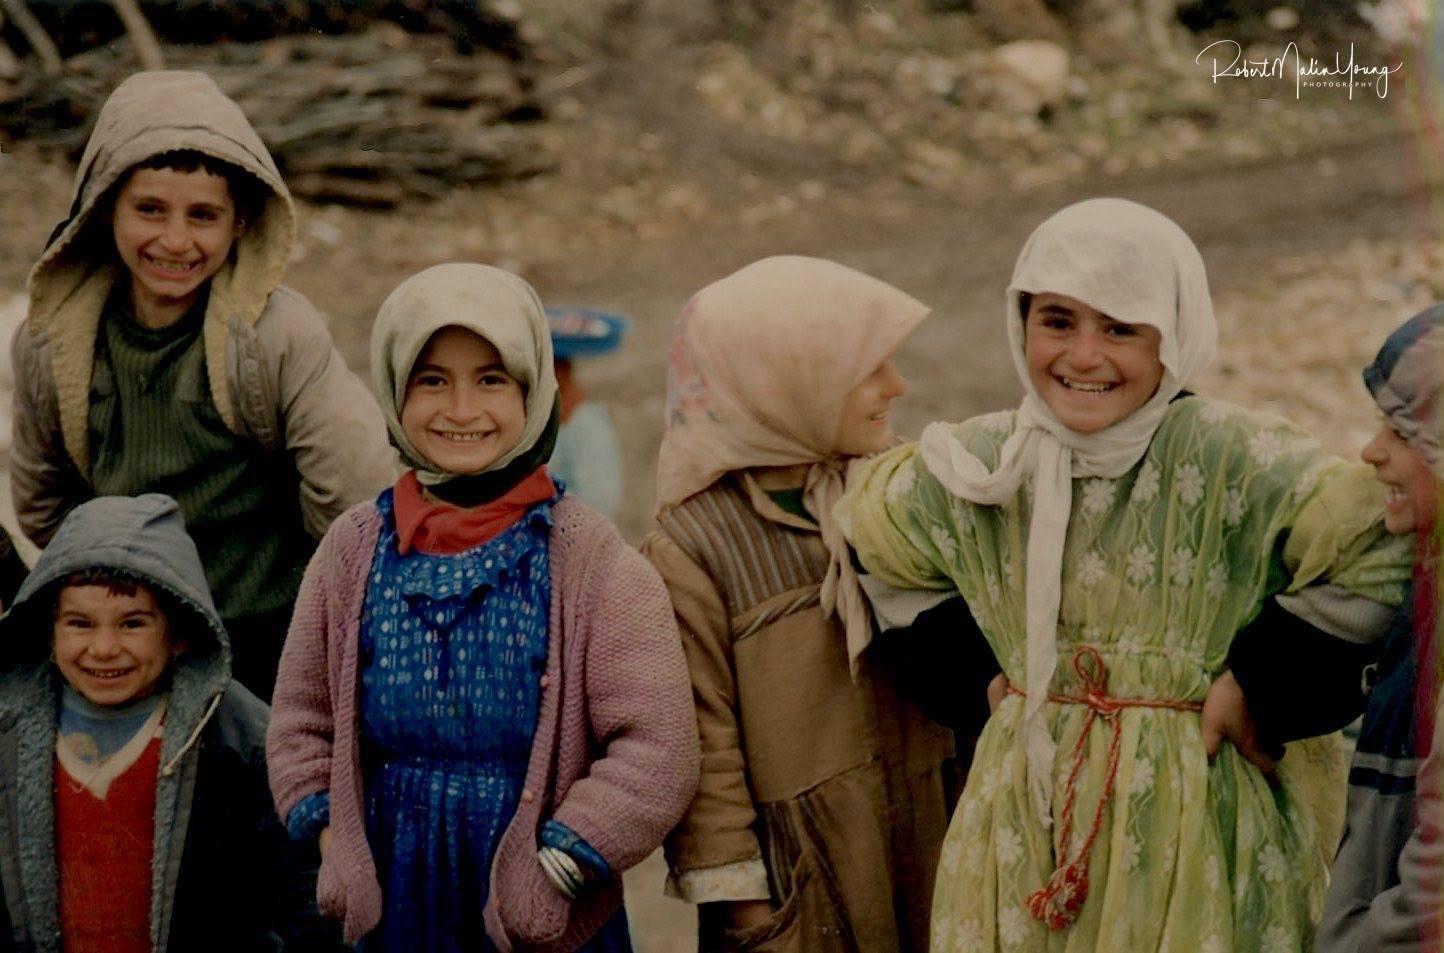 The Family of Man - Kurdistan, Iraq 1992  by Robert Malin Young